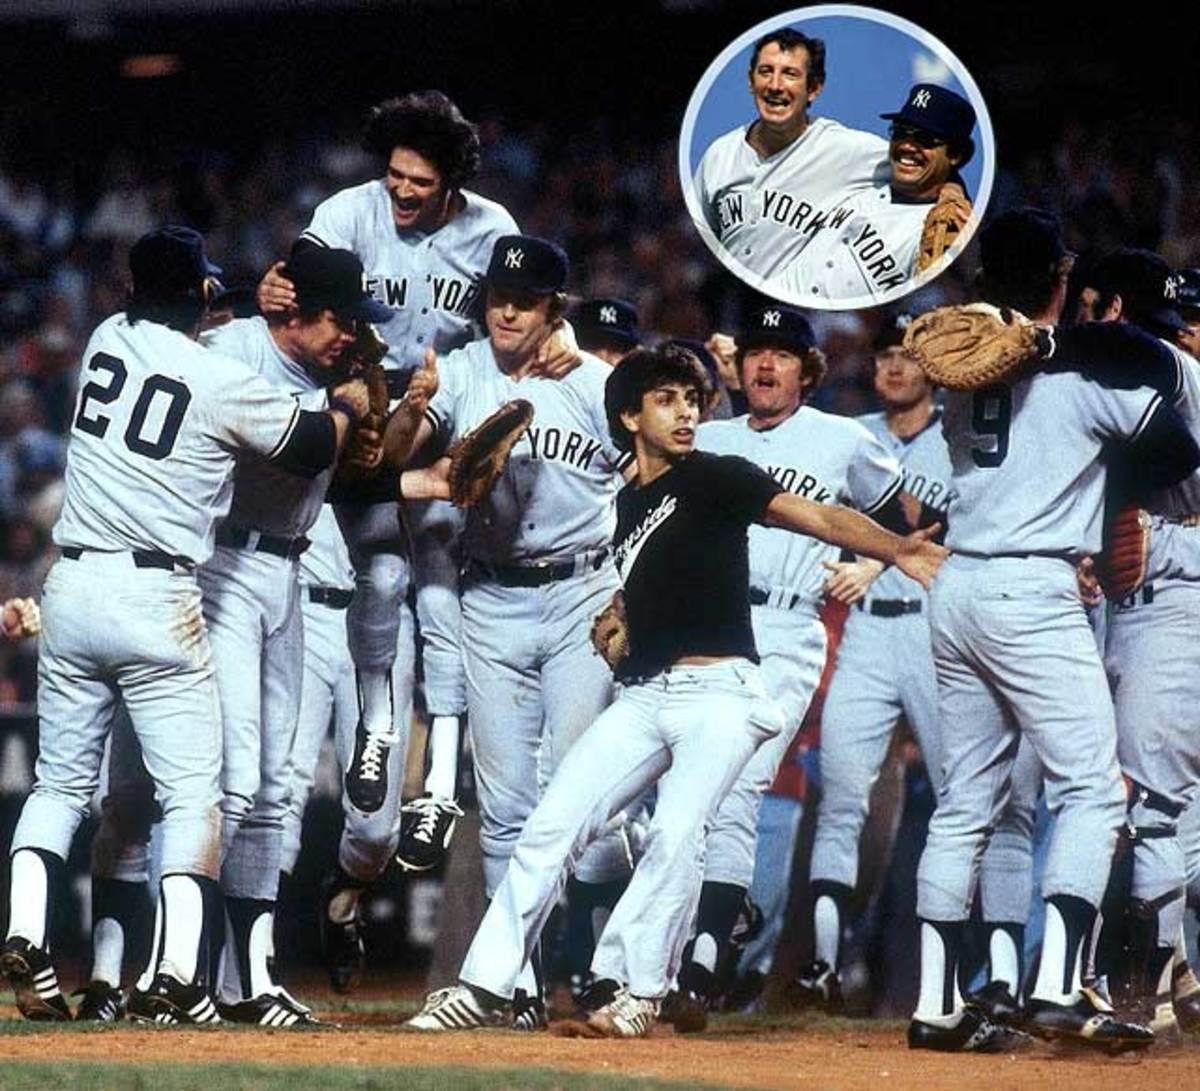 1978 New York Yankees